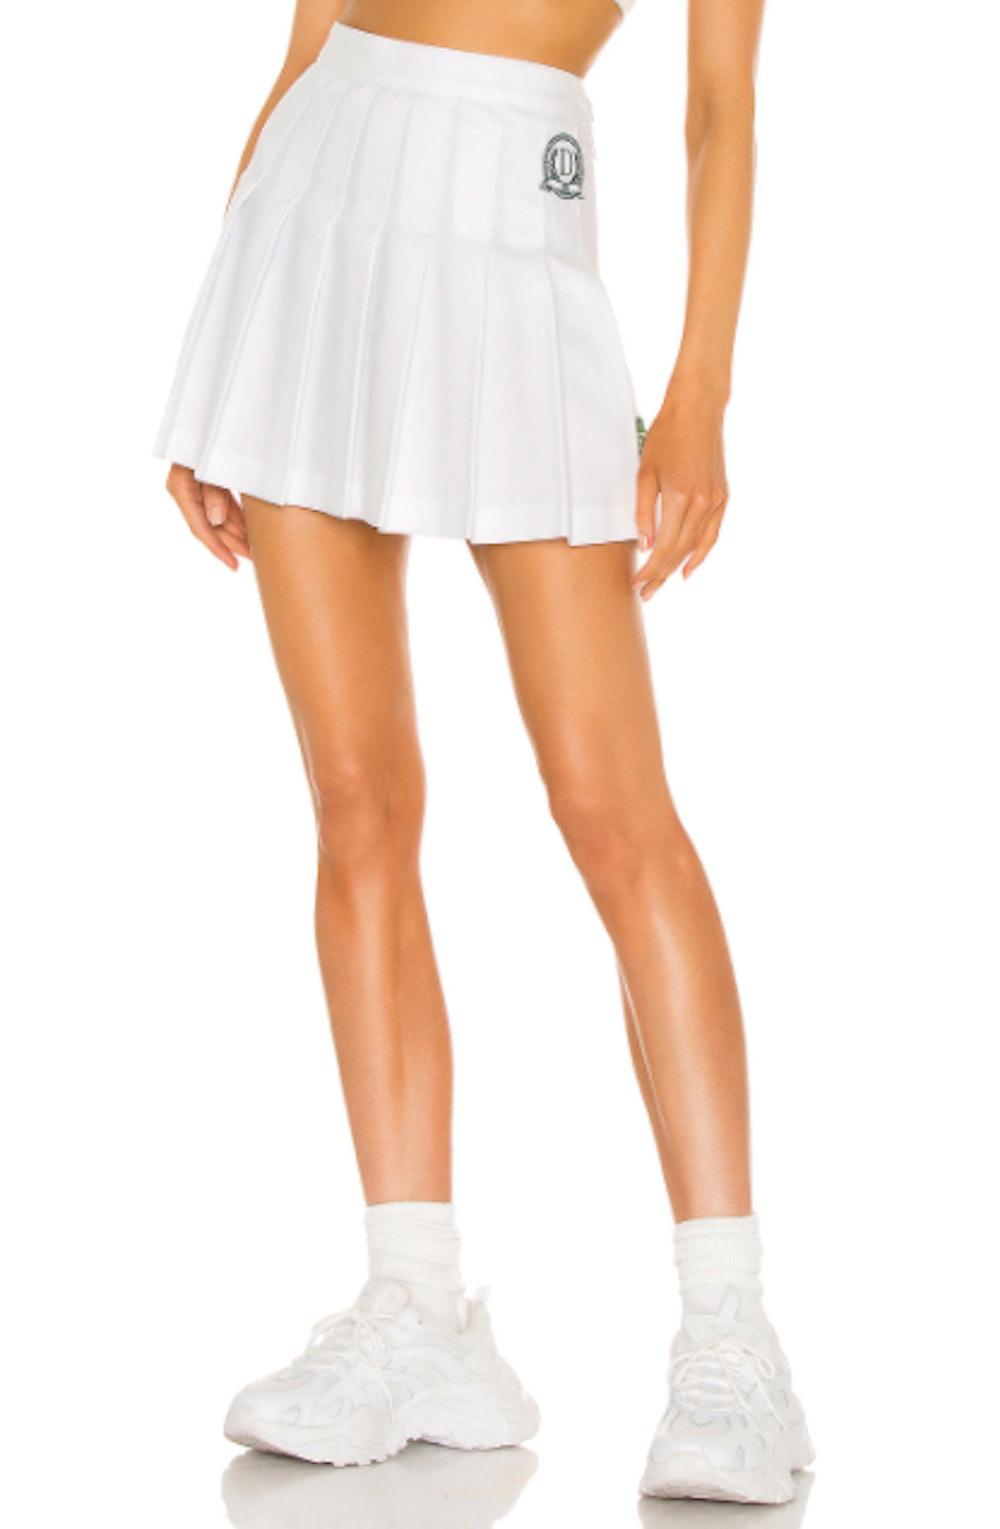 x REVOLVE Tennis Skirt DANZY brand: